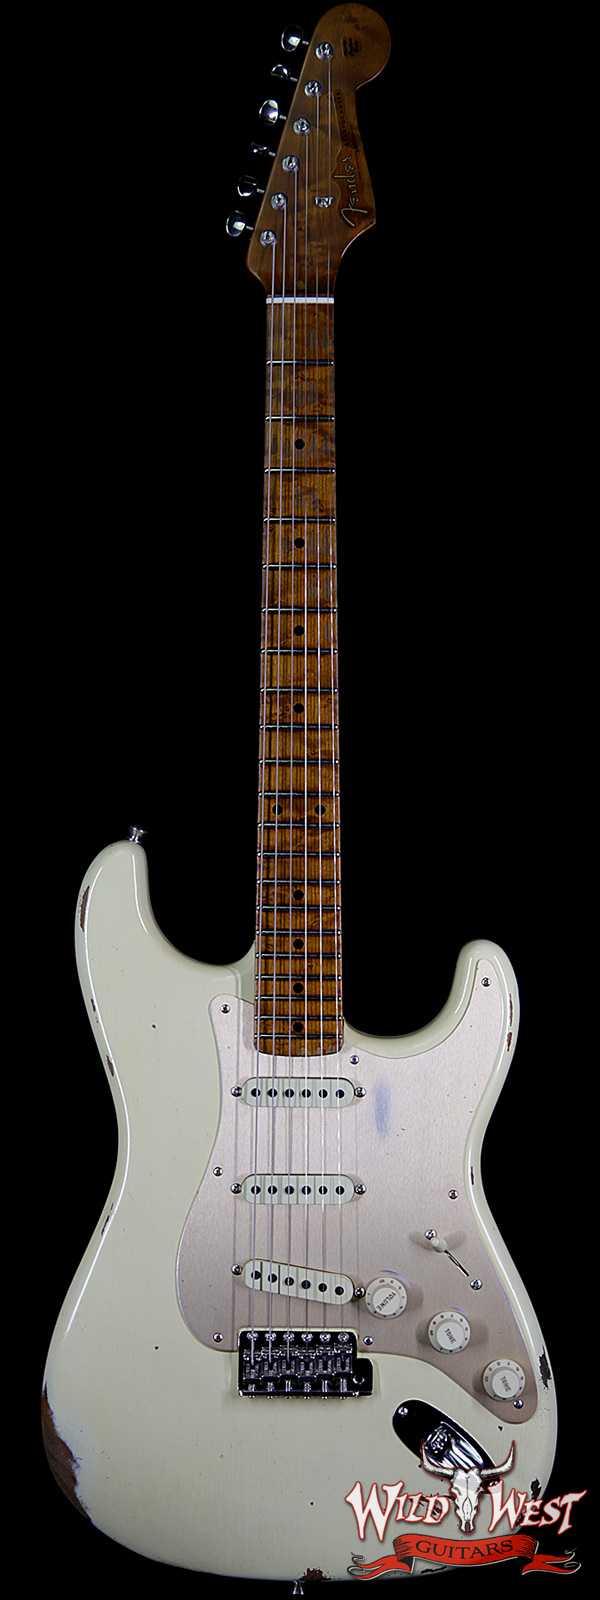 Fender Custom Shop 1956 Stratocaster Relic Roasted Birdeye Maple Neck Aged Vintage White